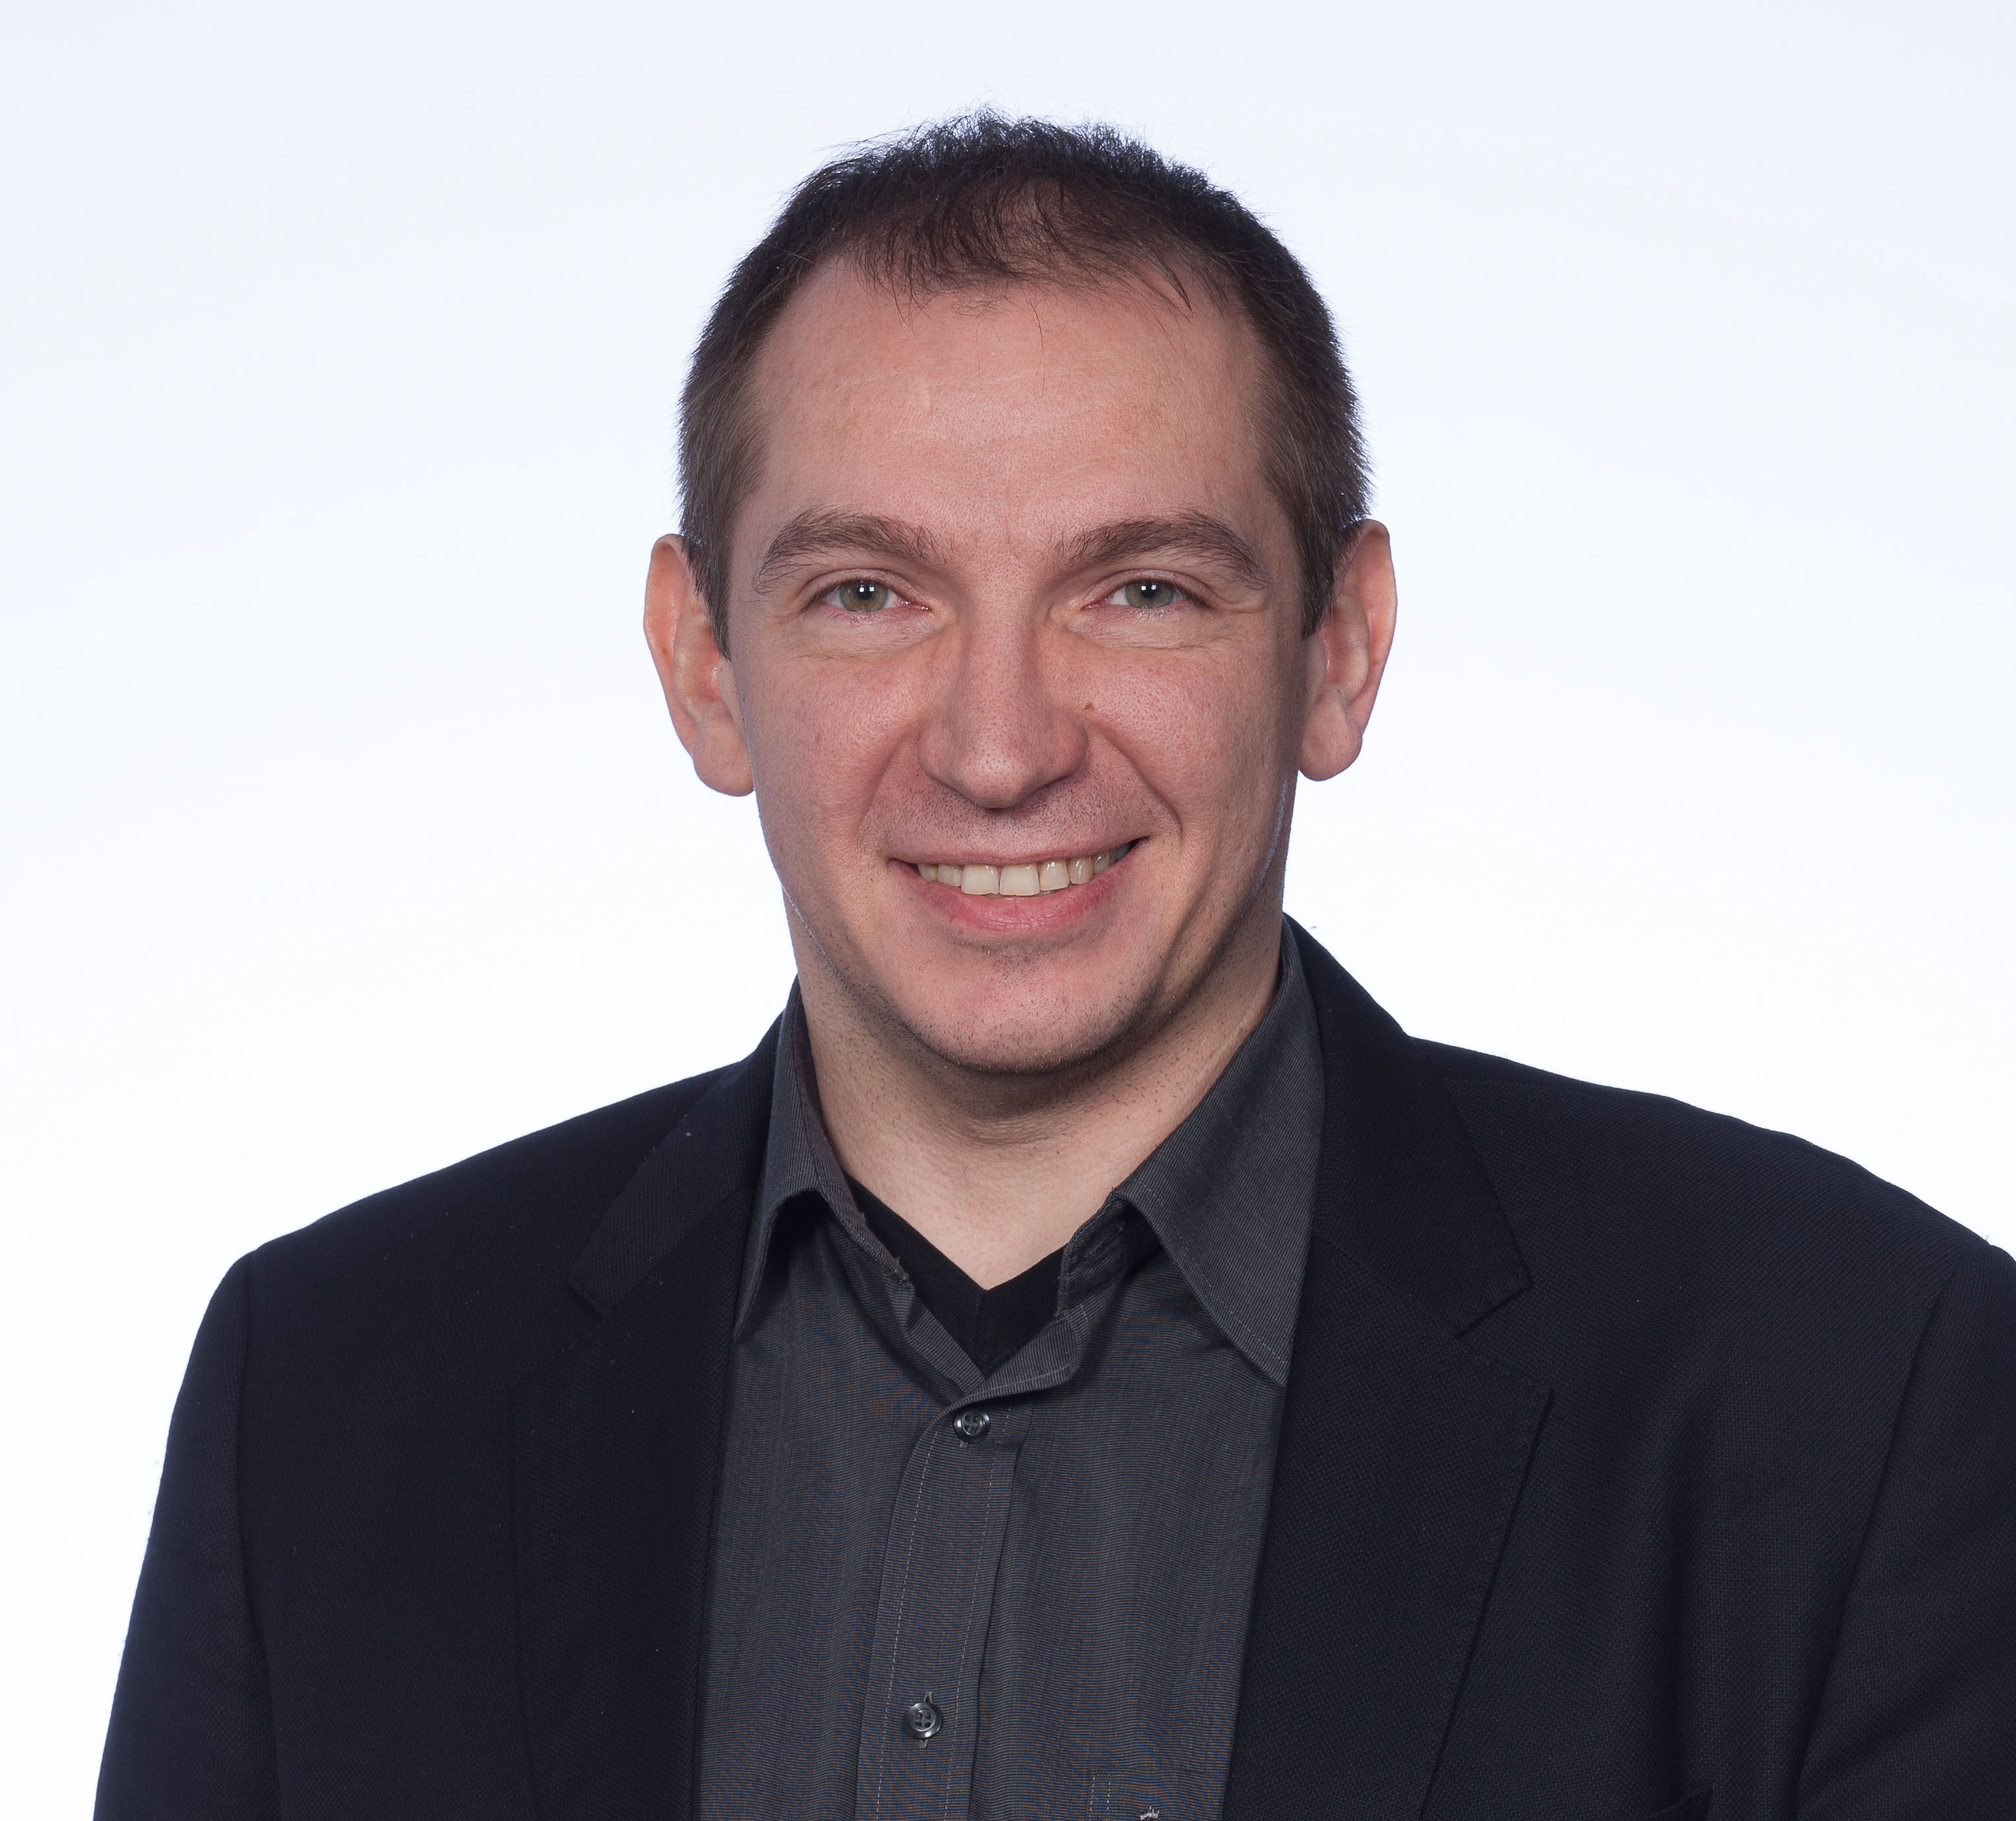 Robert Penski